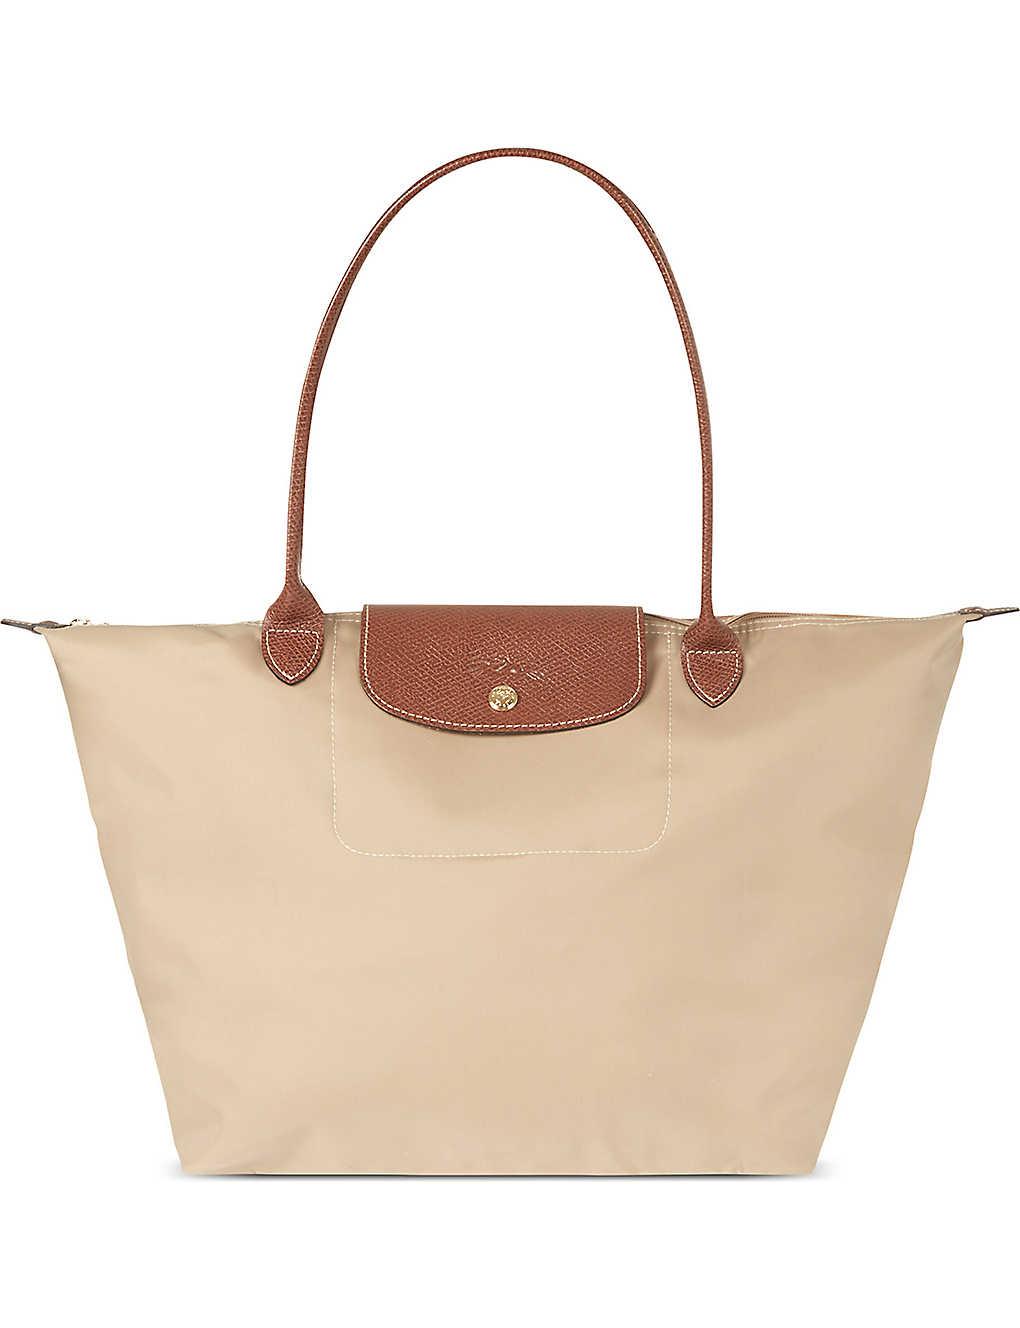 Latest Cheap Longchamp Le Pliage Tote Bags 1899 089 Khaki Beige. Back to Top .